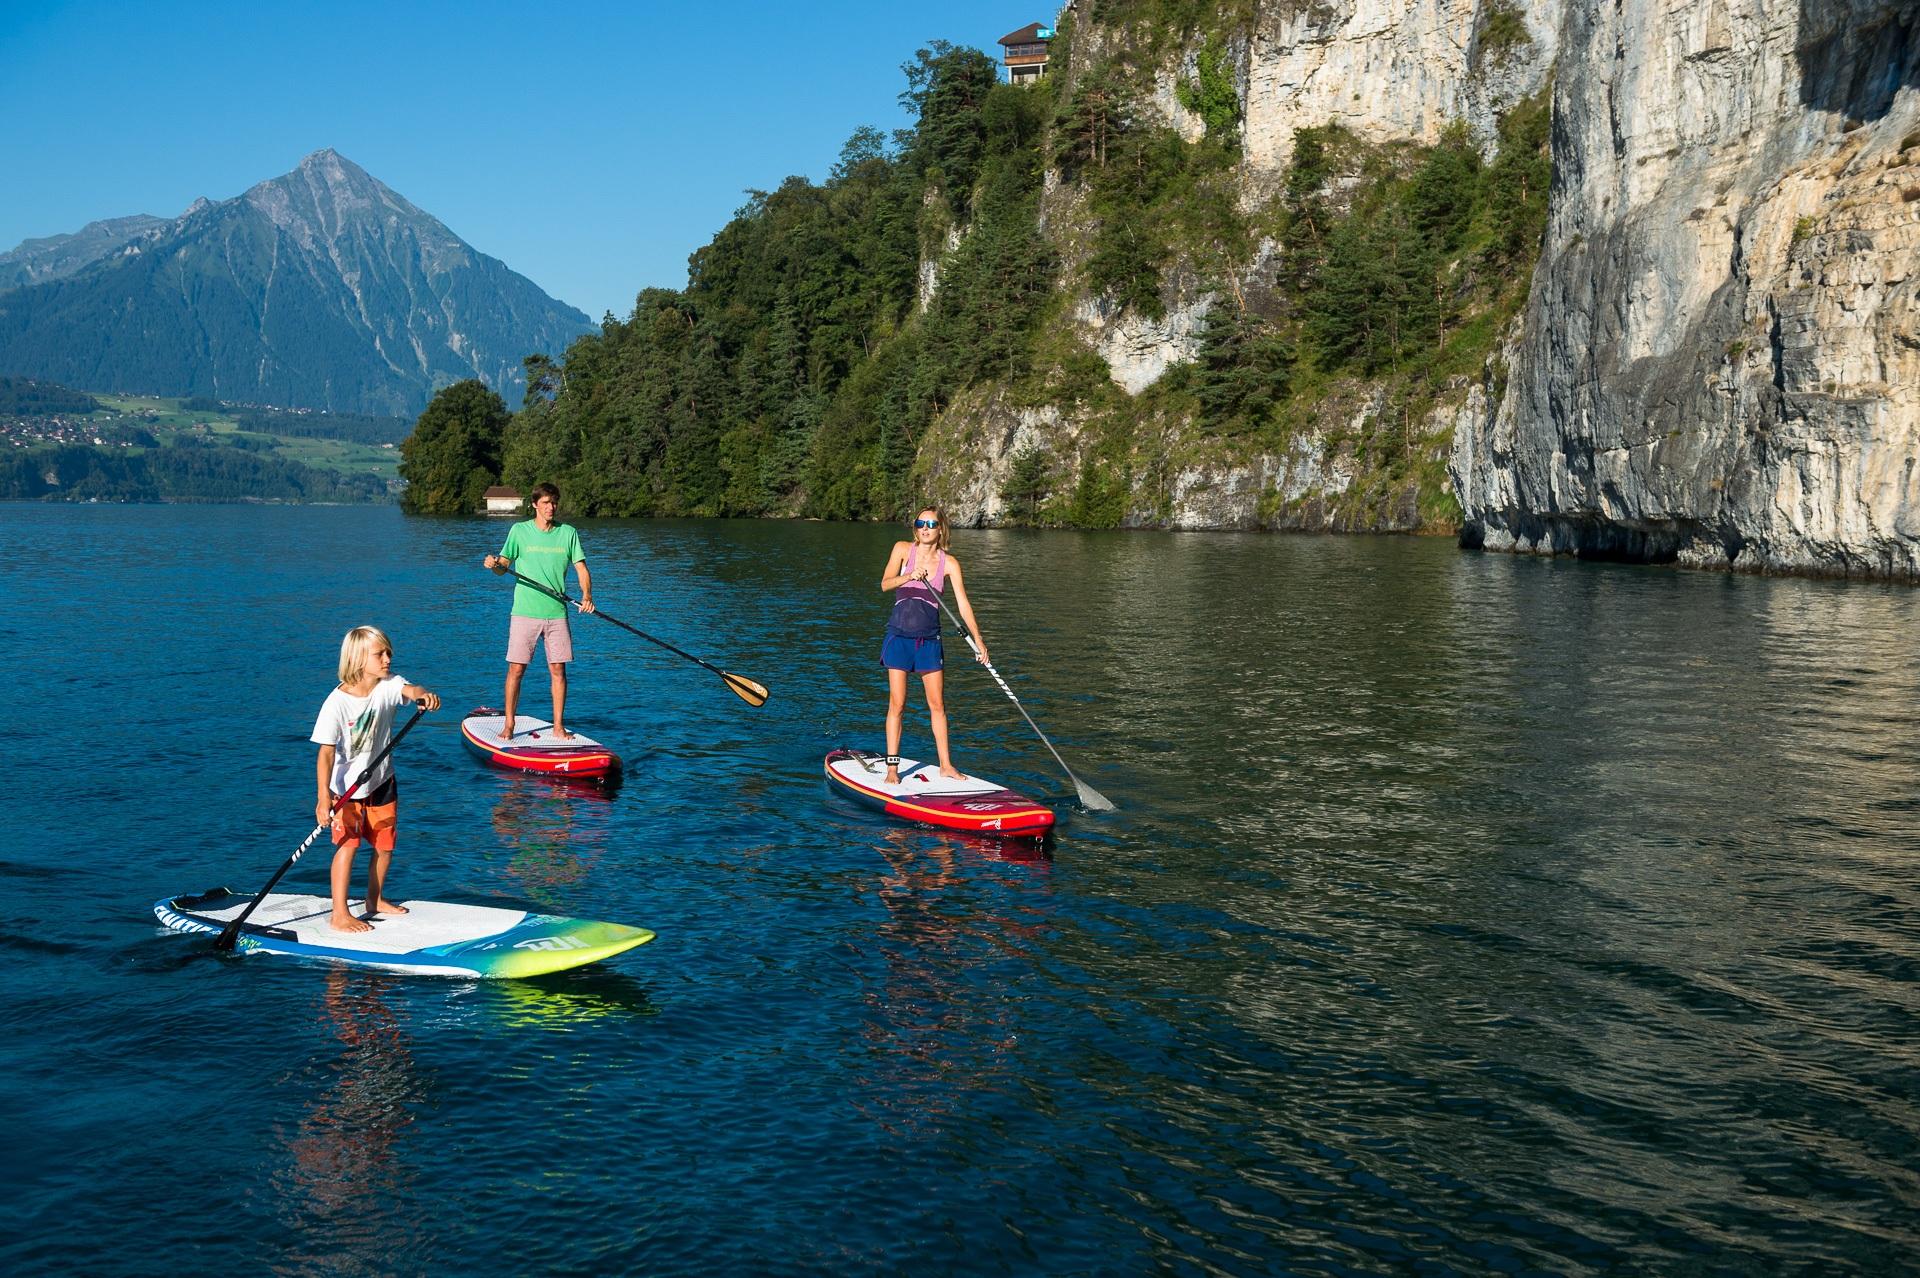 mountainsurf-stand-up-paddle-sommer-wasseraktivit-t-thunersee